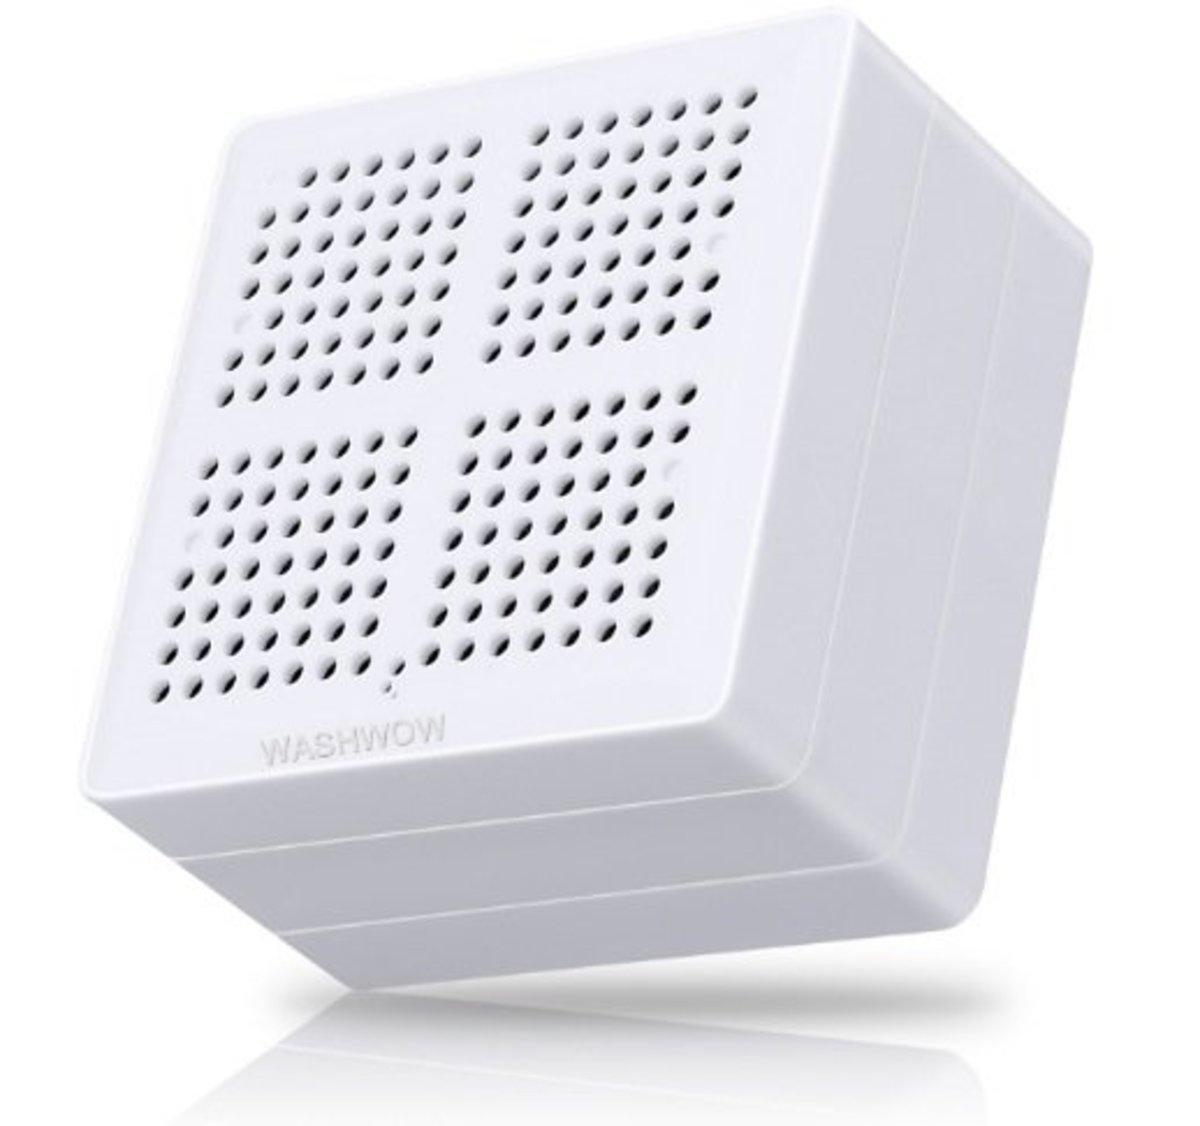 Washwow 2.0 無線充電便攜洗衣蛋